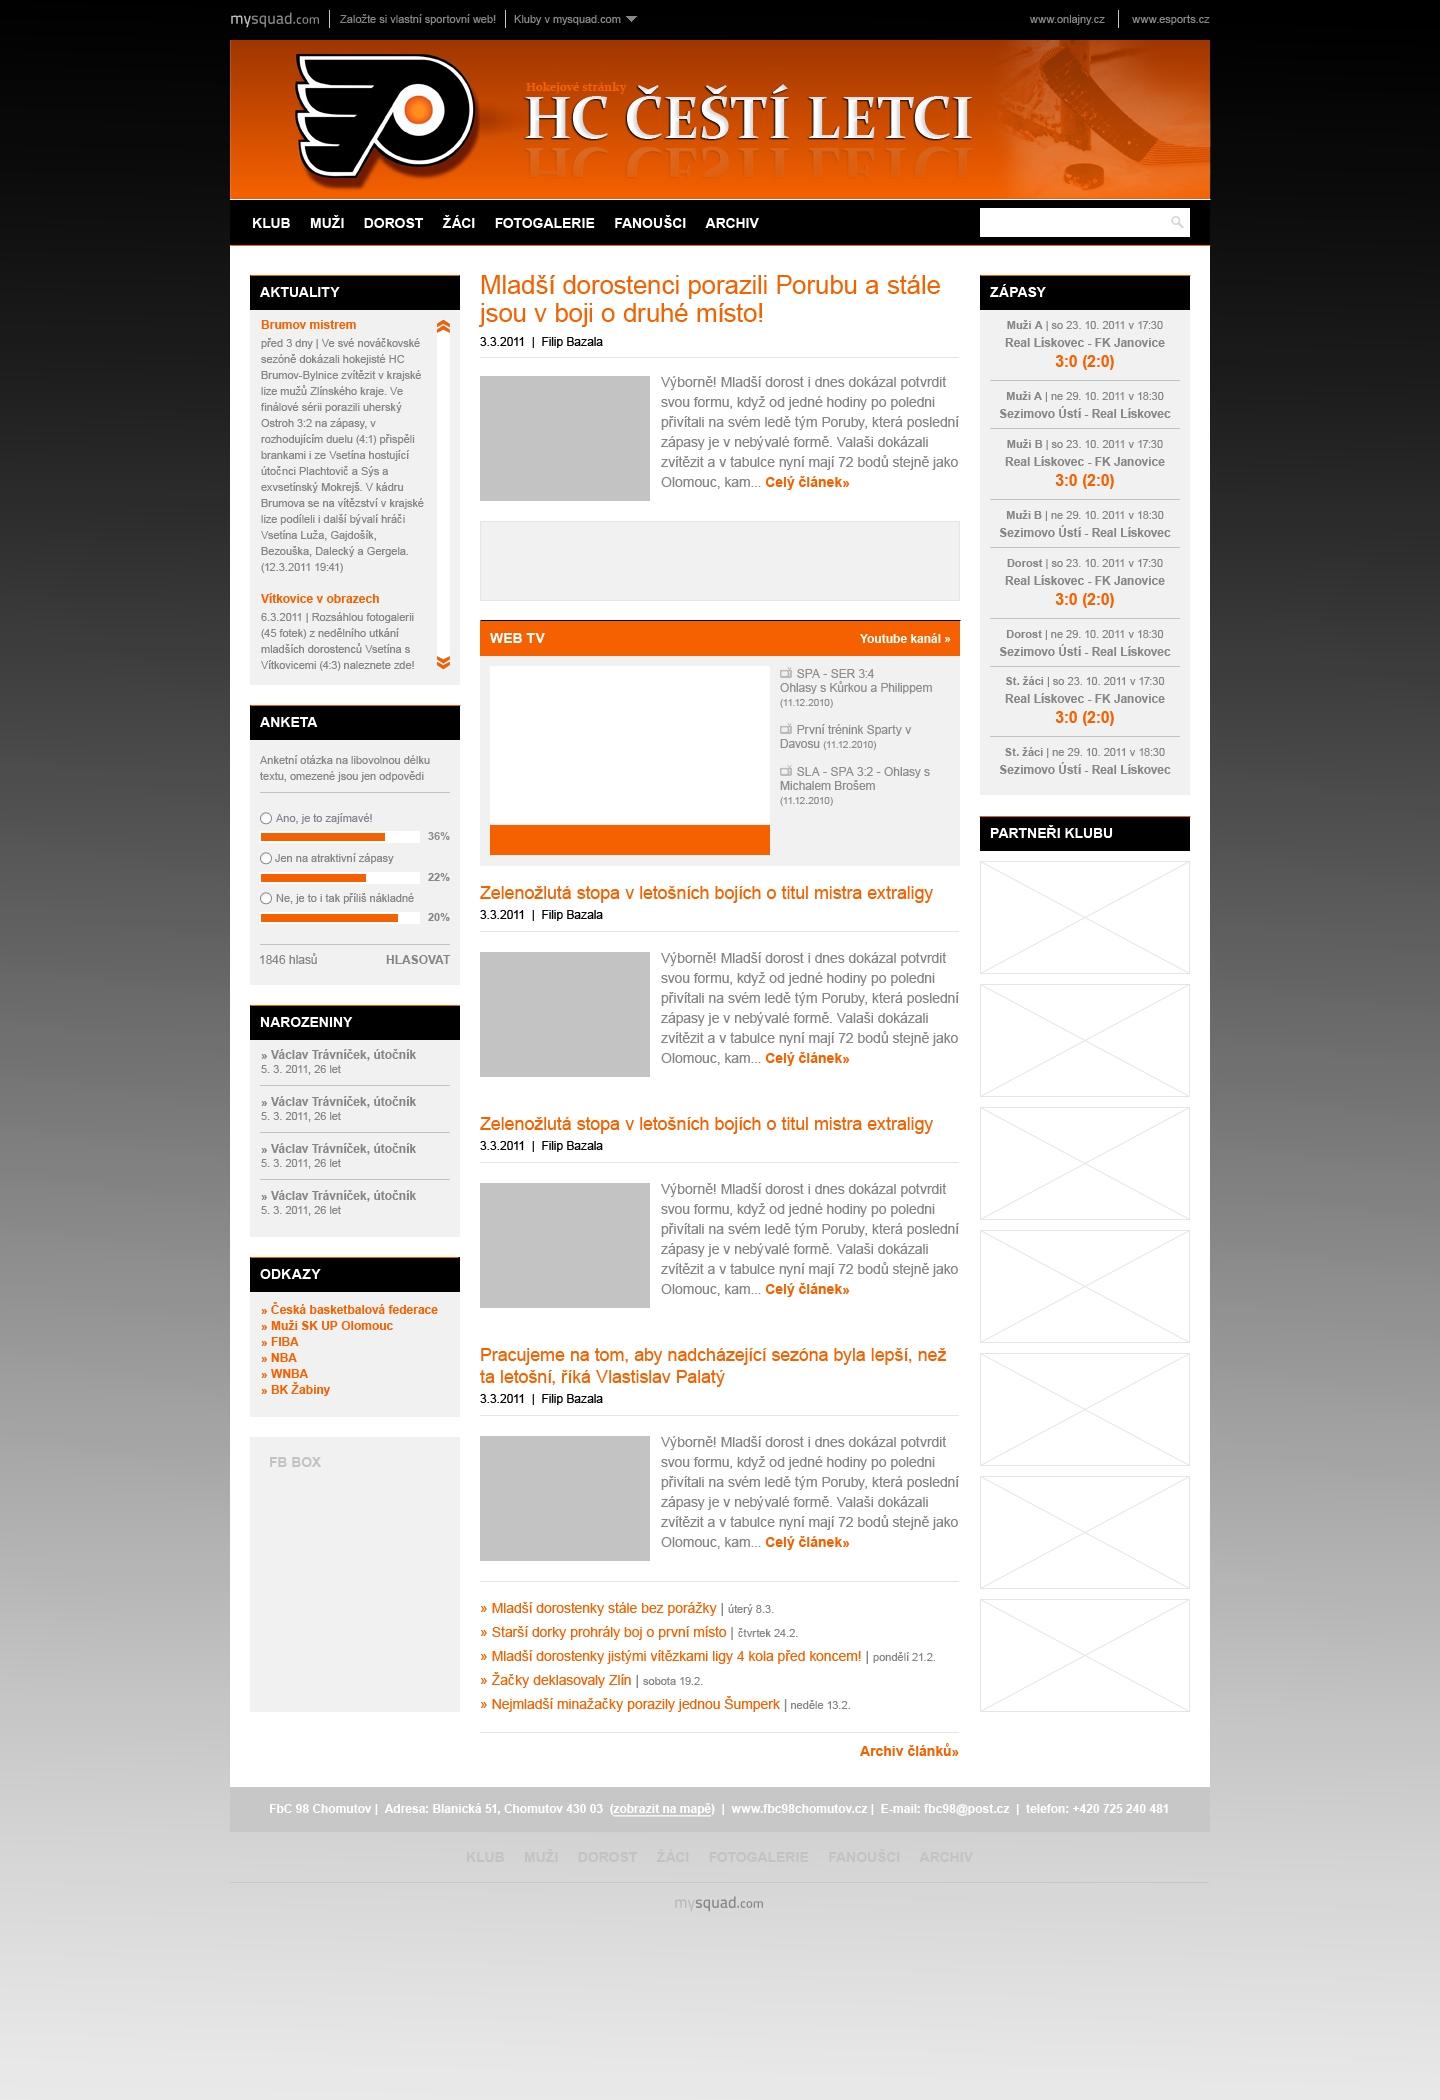 http://myteamweb.laura.esports.cz/wp-content/uploads/ether/cesti-letci4-thumb0x0.jpg